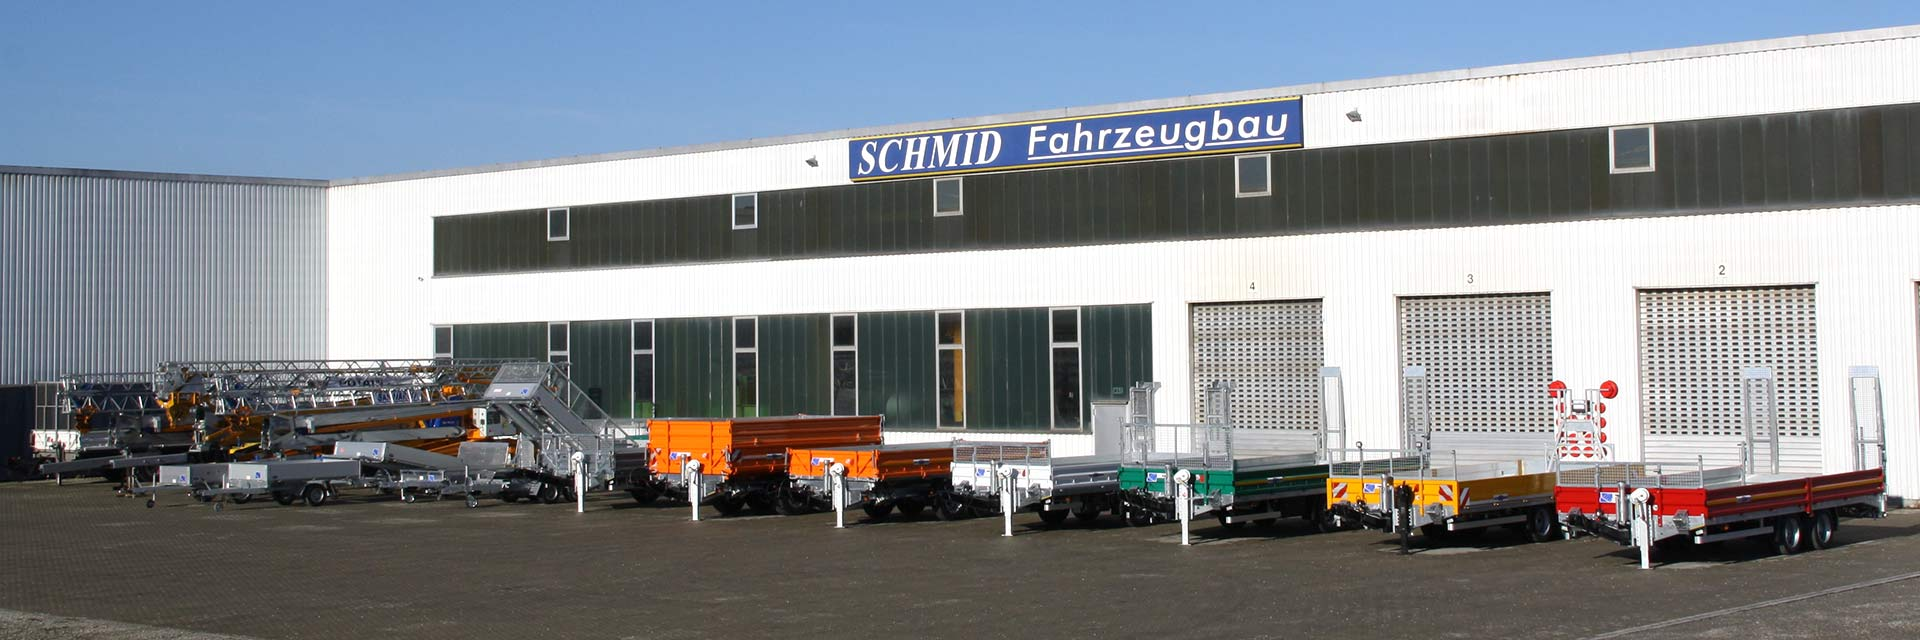 Schmid Fahrzeugbau / PKW-Anhänger, LKW-Anhänger, ...